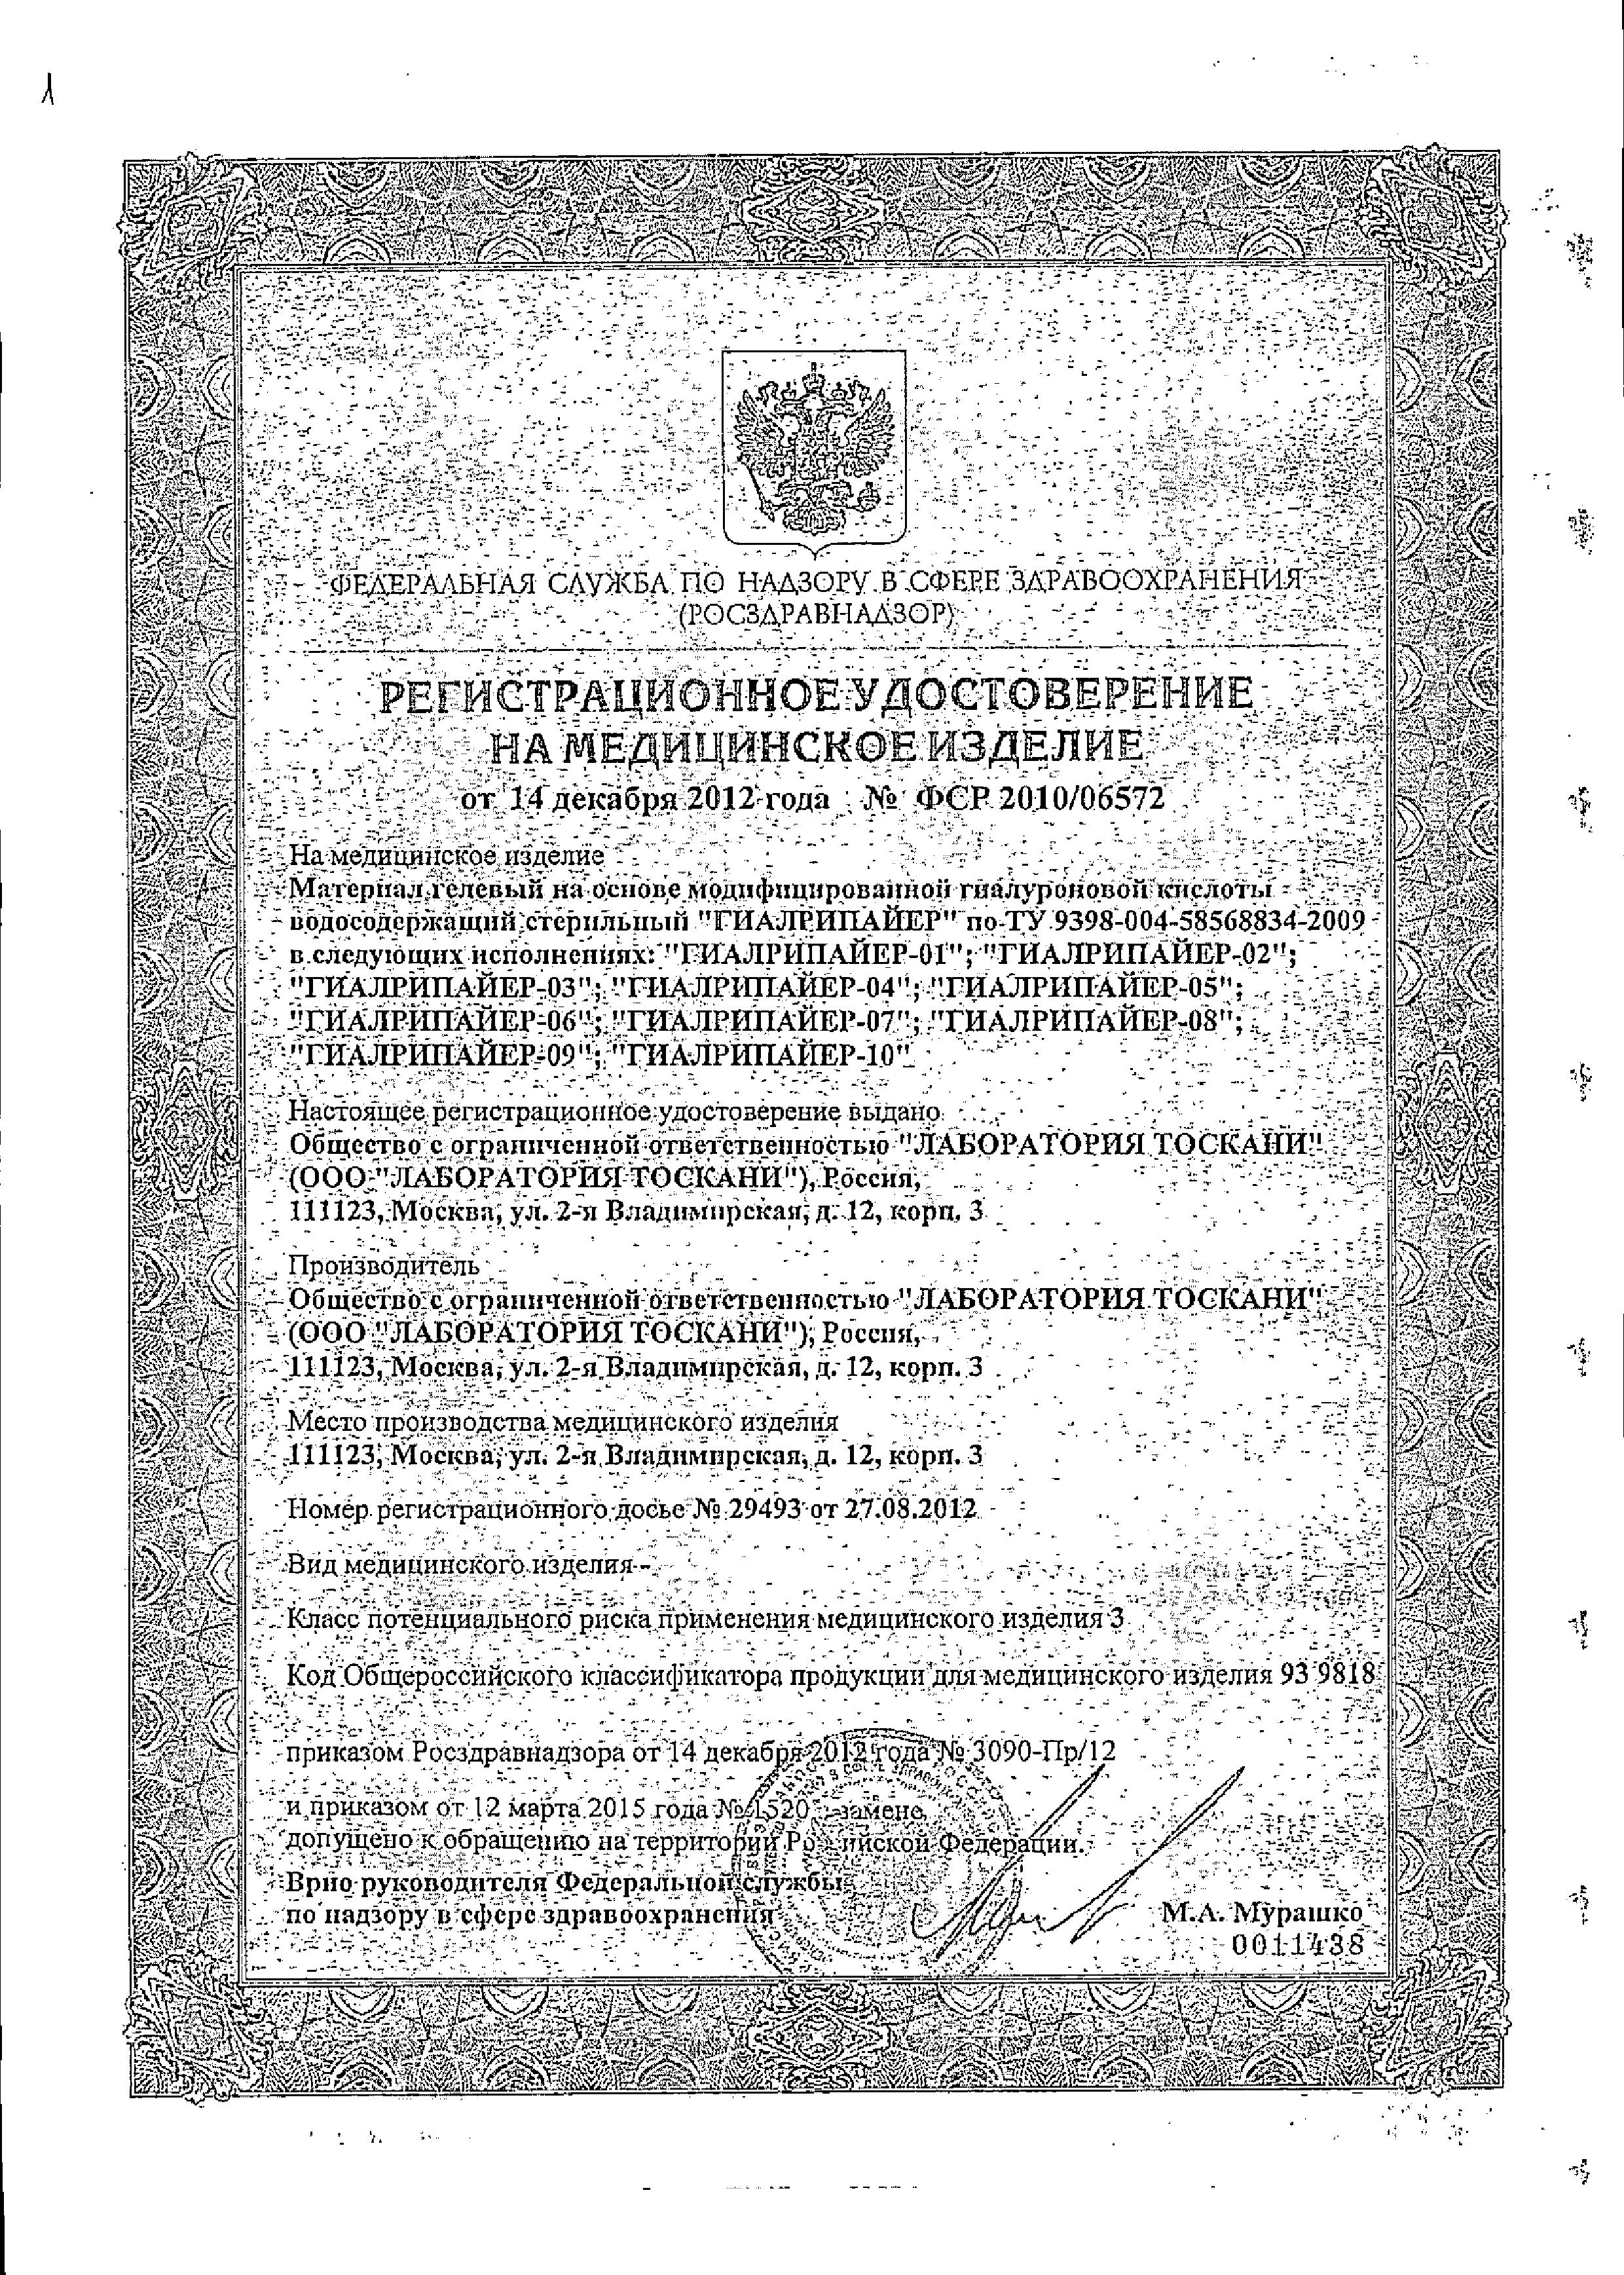 Хондрорепарант Гиалрипайер-10 0,8% гиалуроновой кислоты сертификат